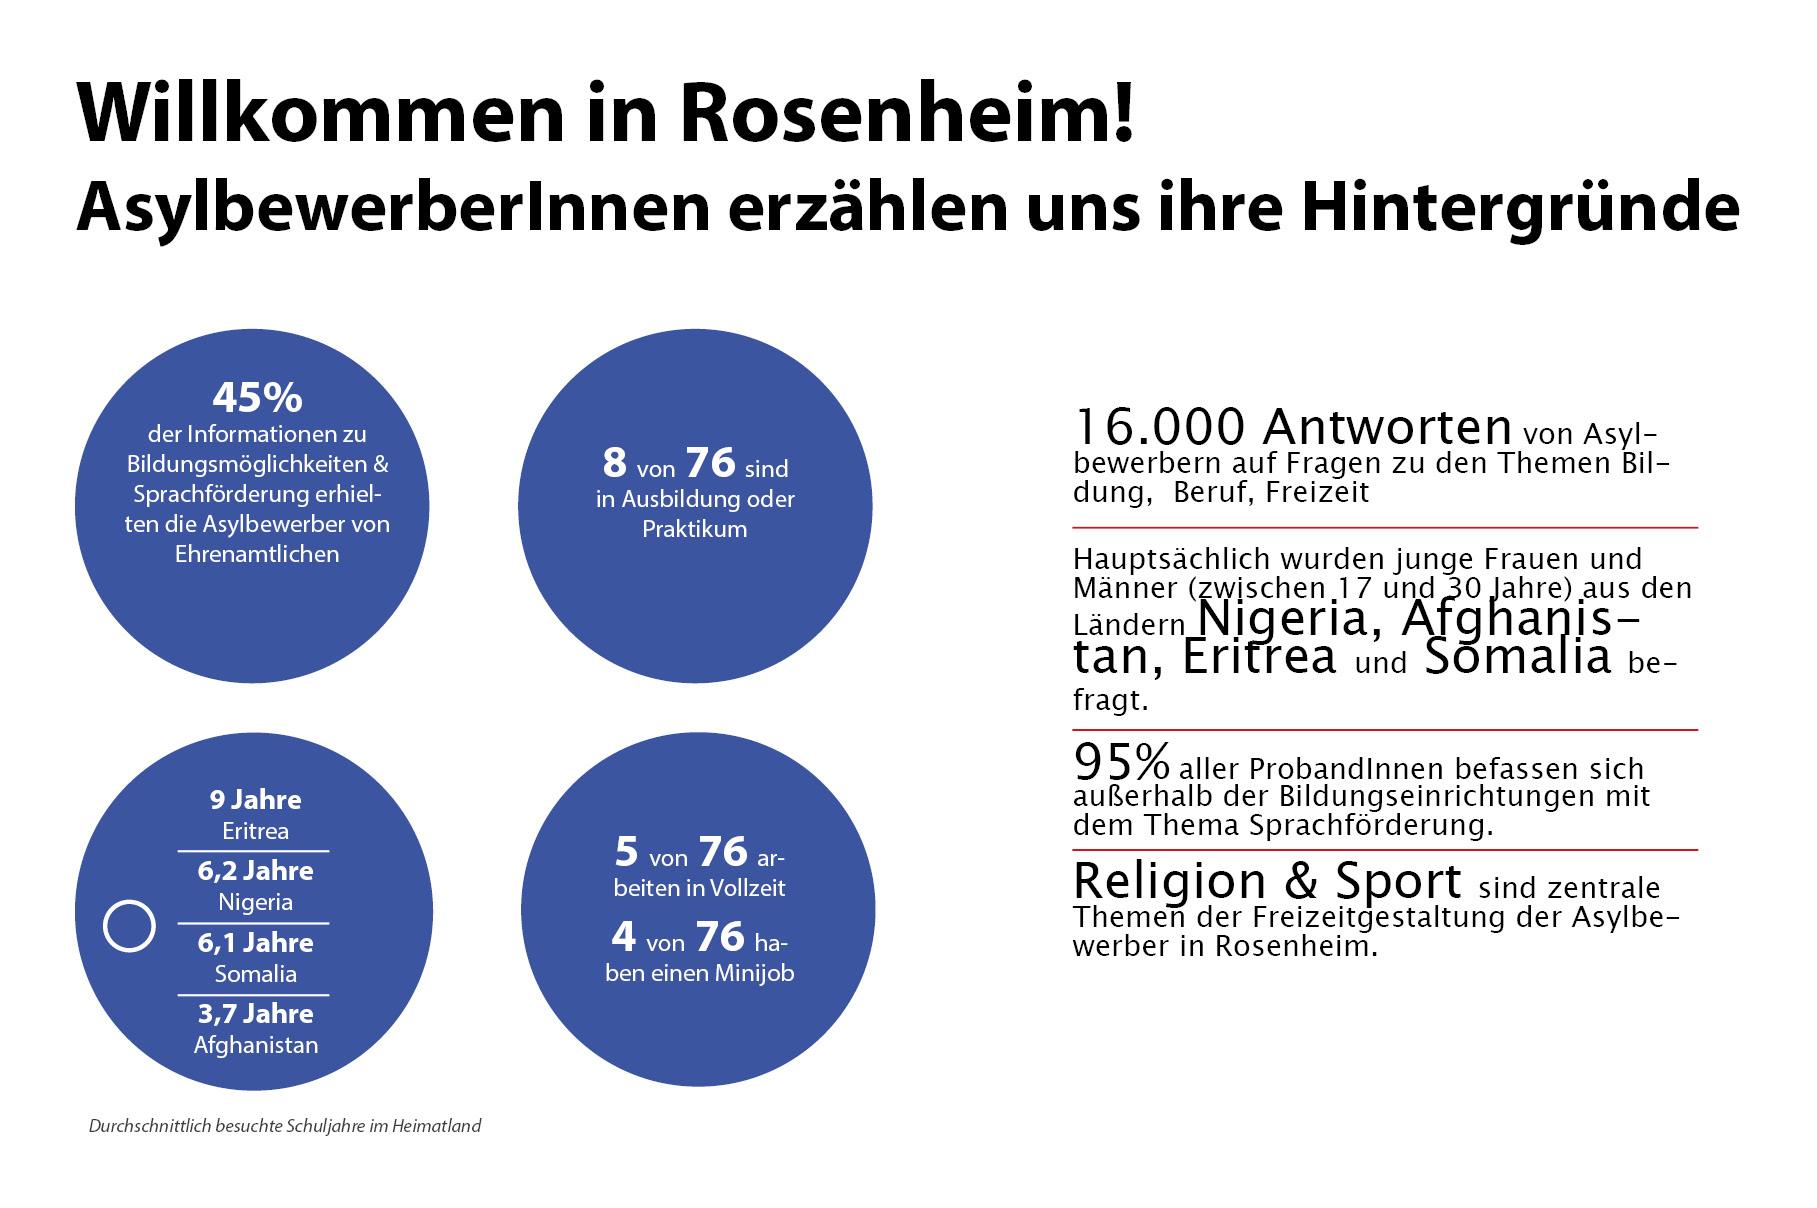 Umfrage in Rosenheimer Asylunterkünften